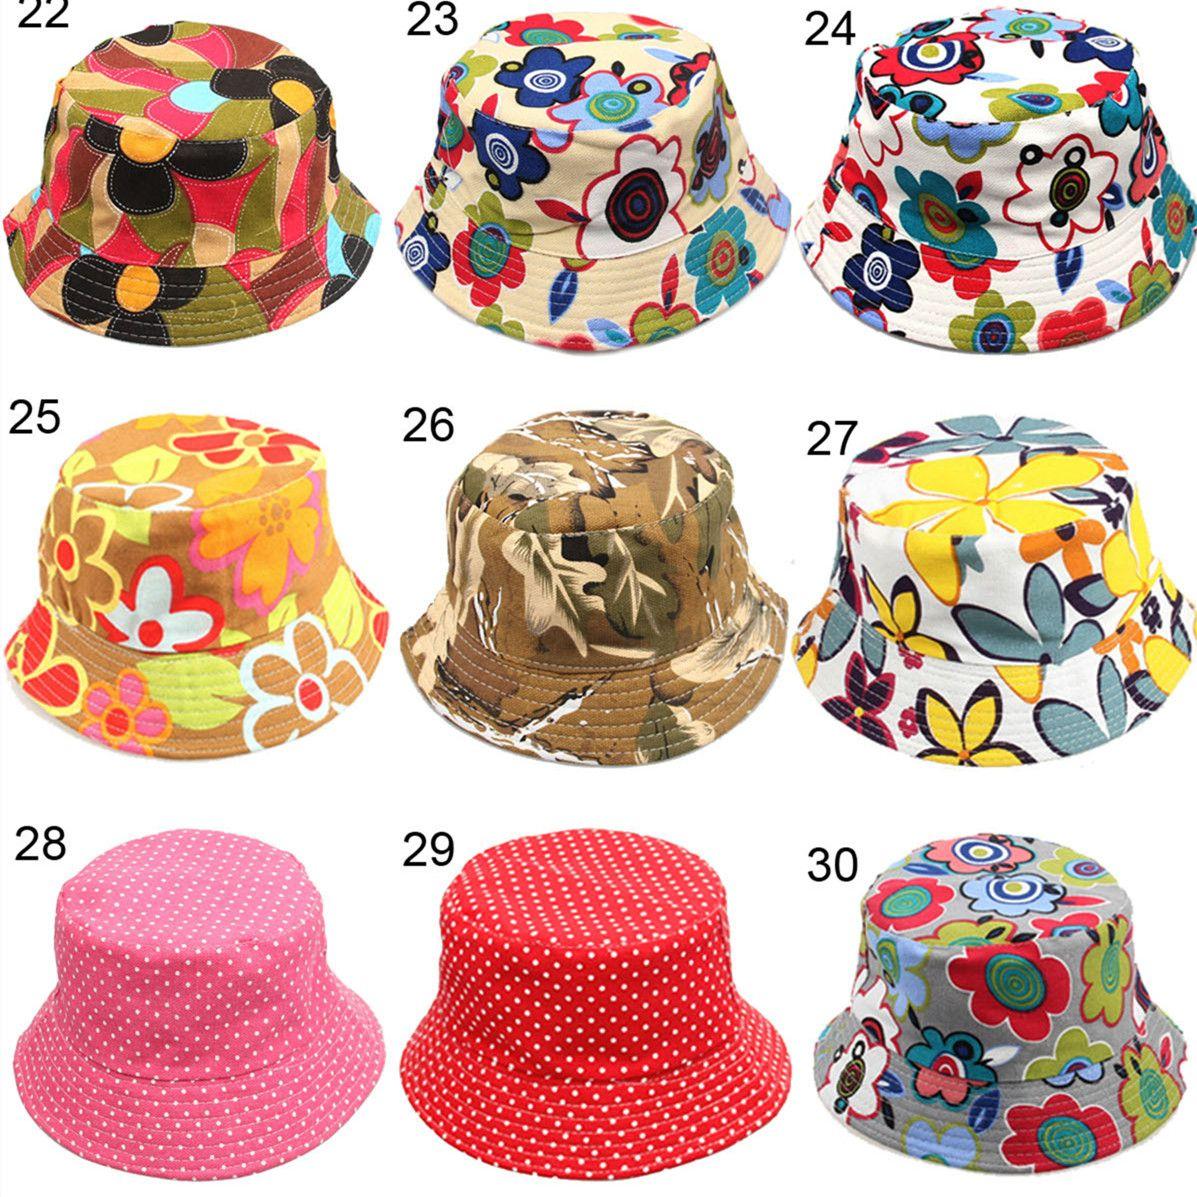 ce5db370cf6 Kids Hats Children Honey Flower Bucket For Baby Packable Foldable Fishing  Cap Summer Wide Brimmed Beach Sun Visor Accessories Children Bucket Hat  Kids Hats ...